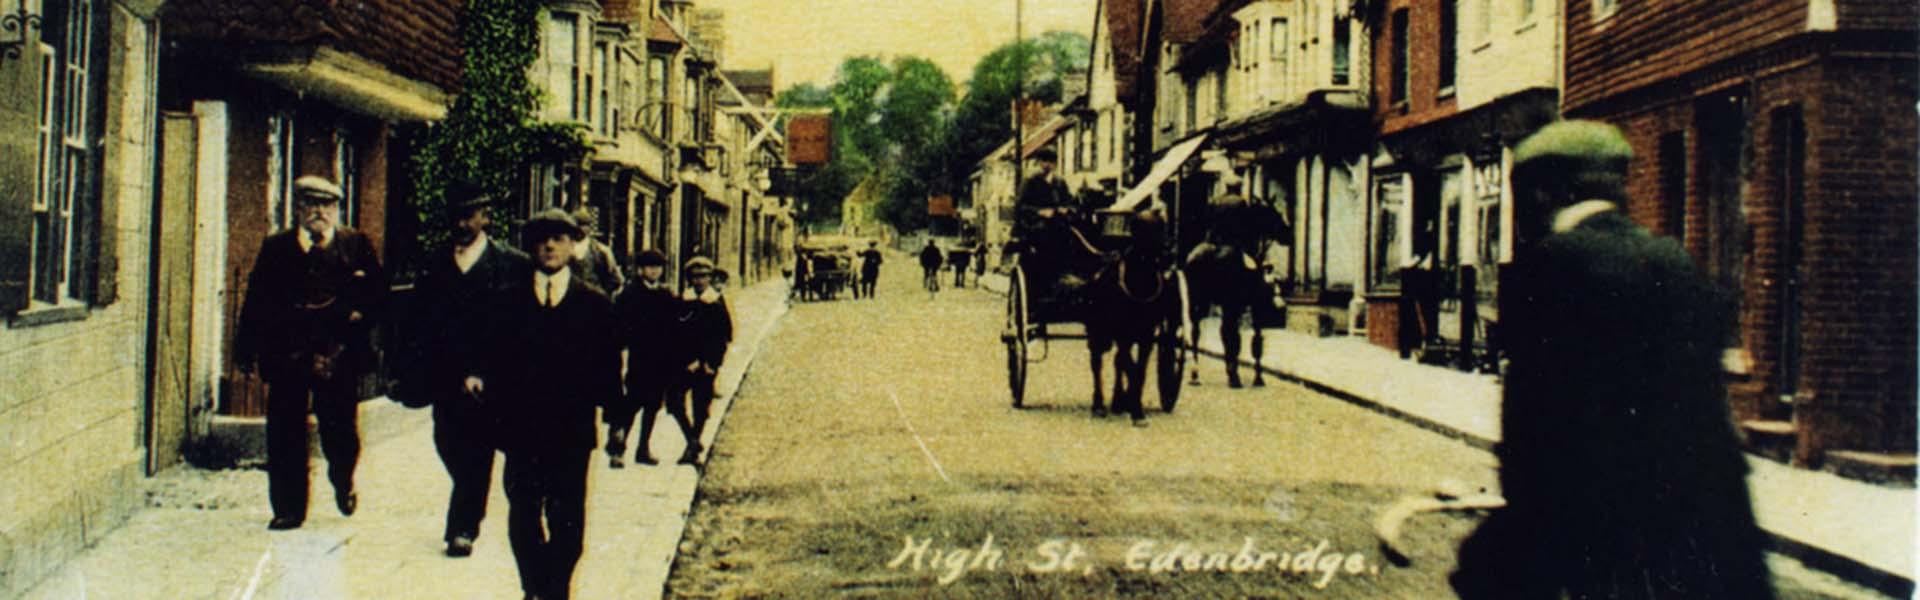 Sepia photograph of Edenbridge High Street